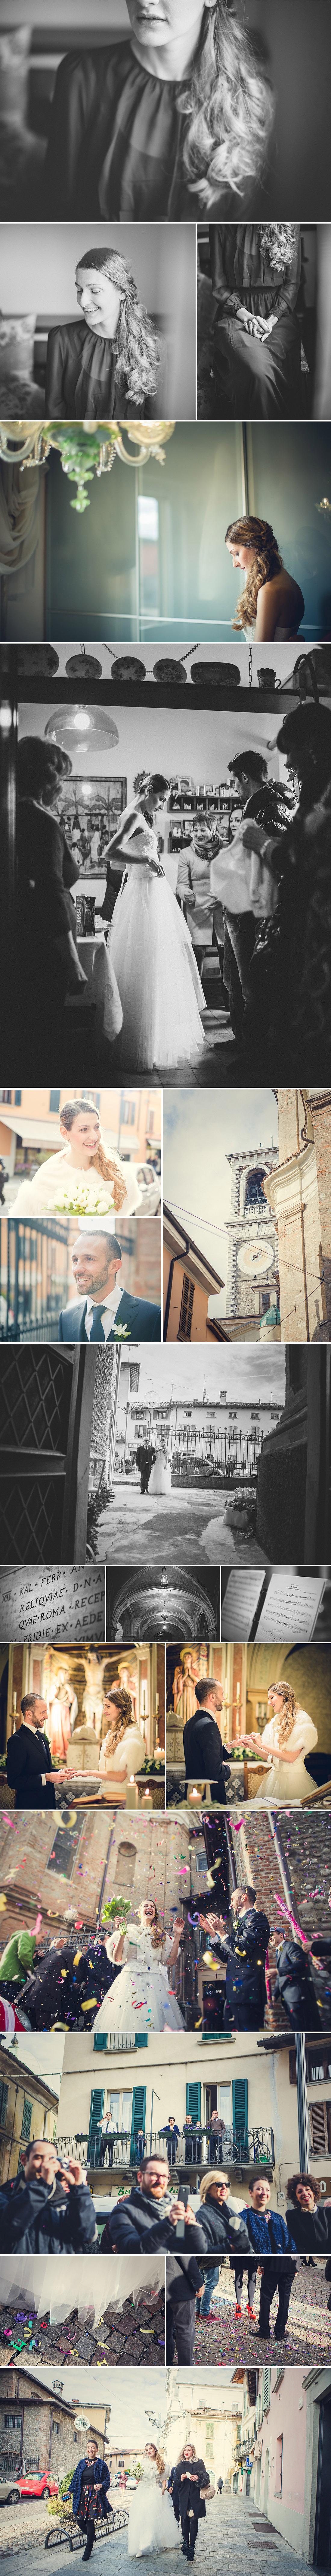 gusmeri_fotografo_matrimonio_sara_massimo1